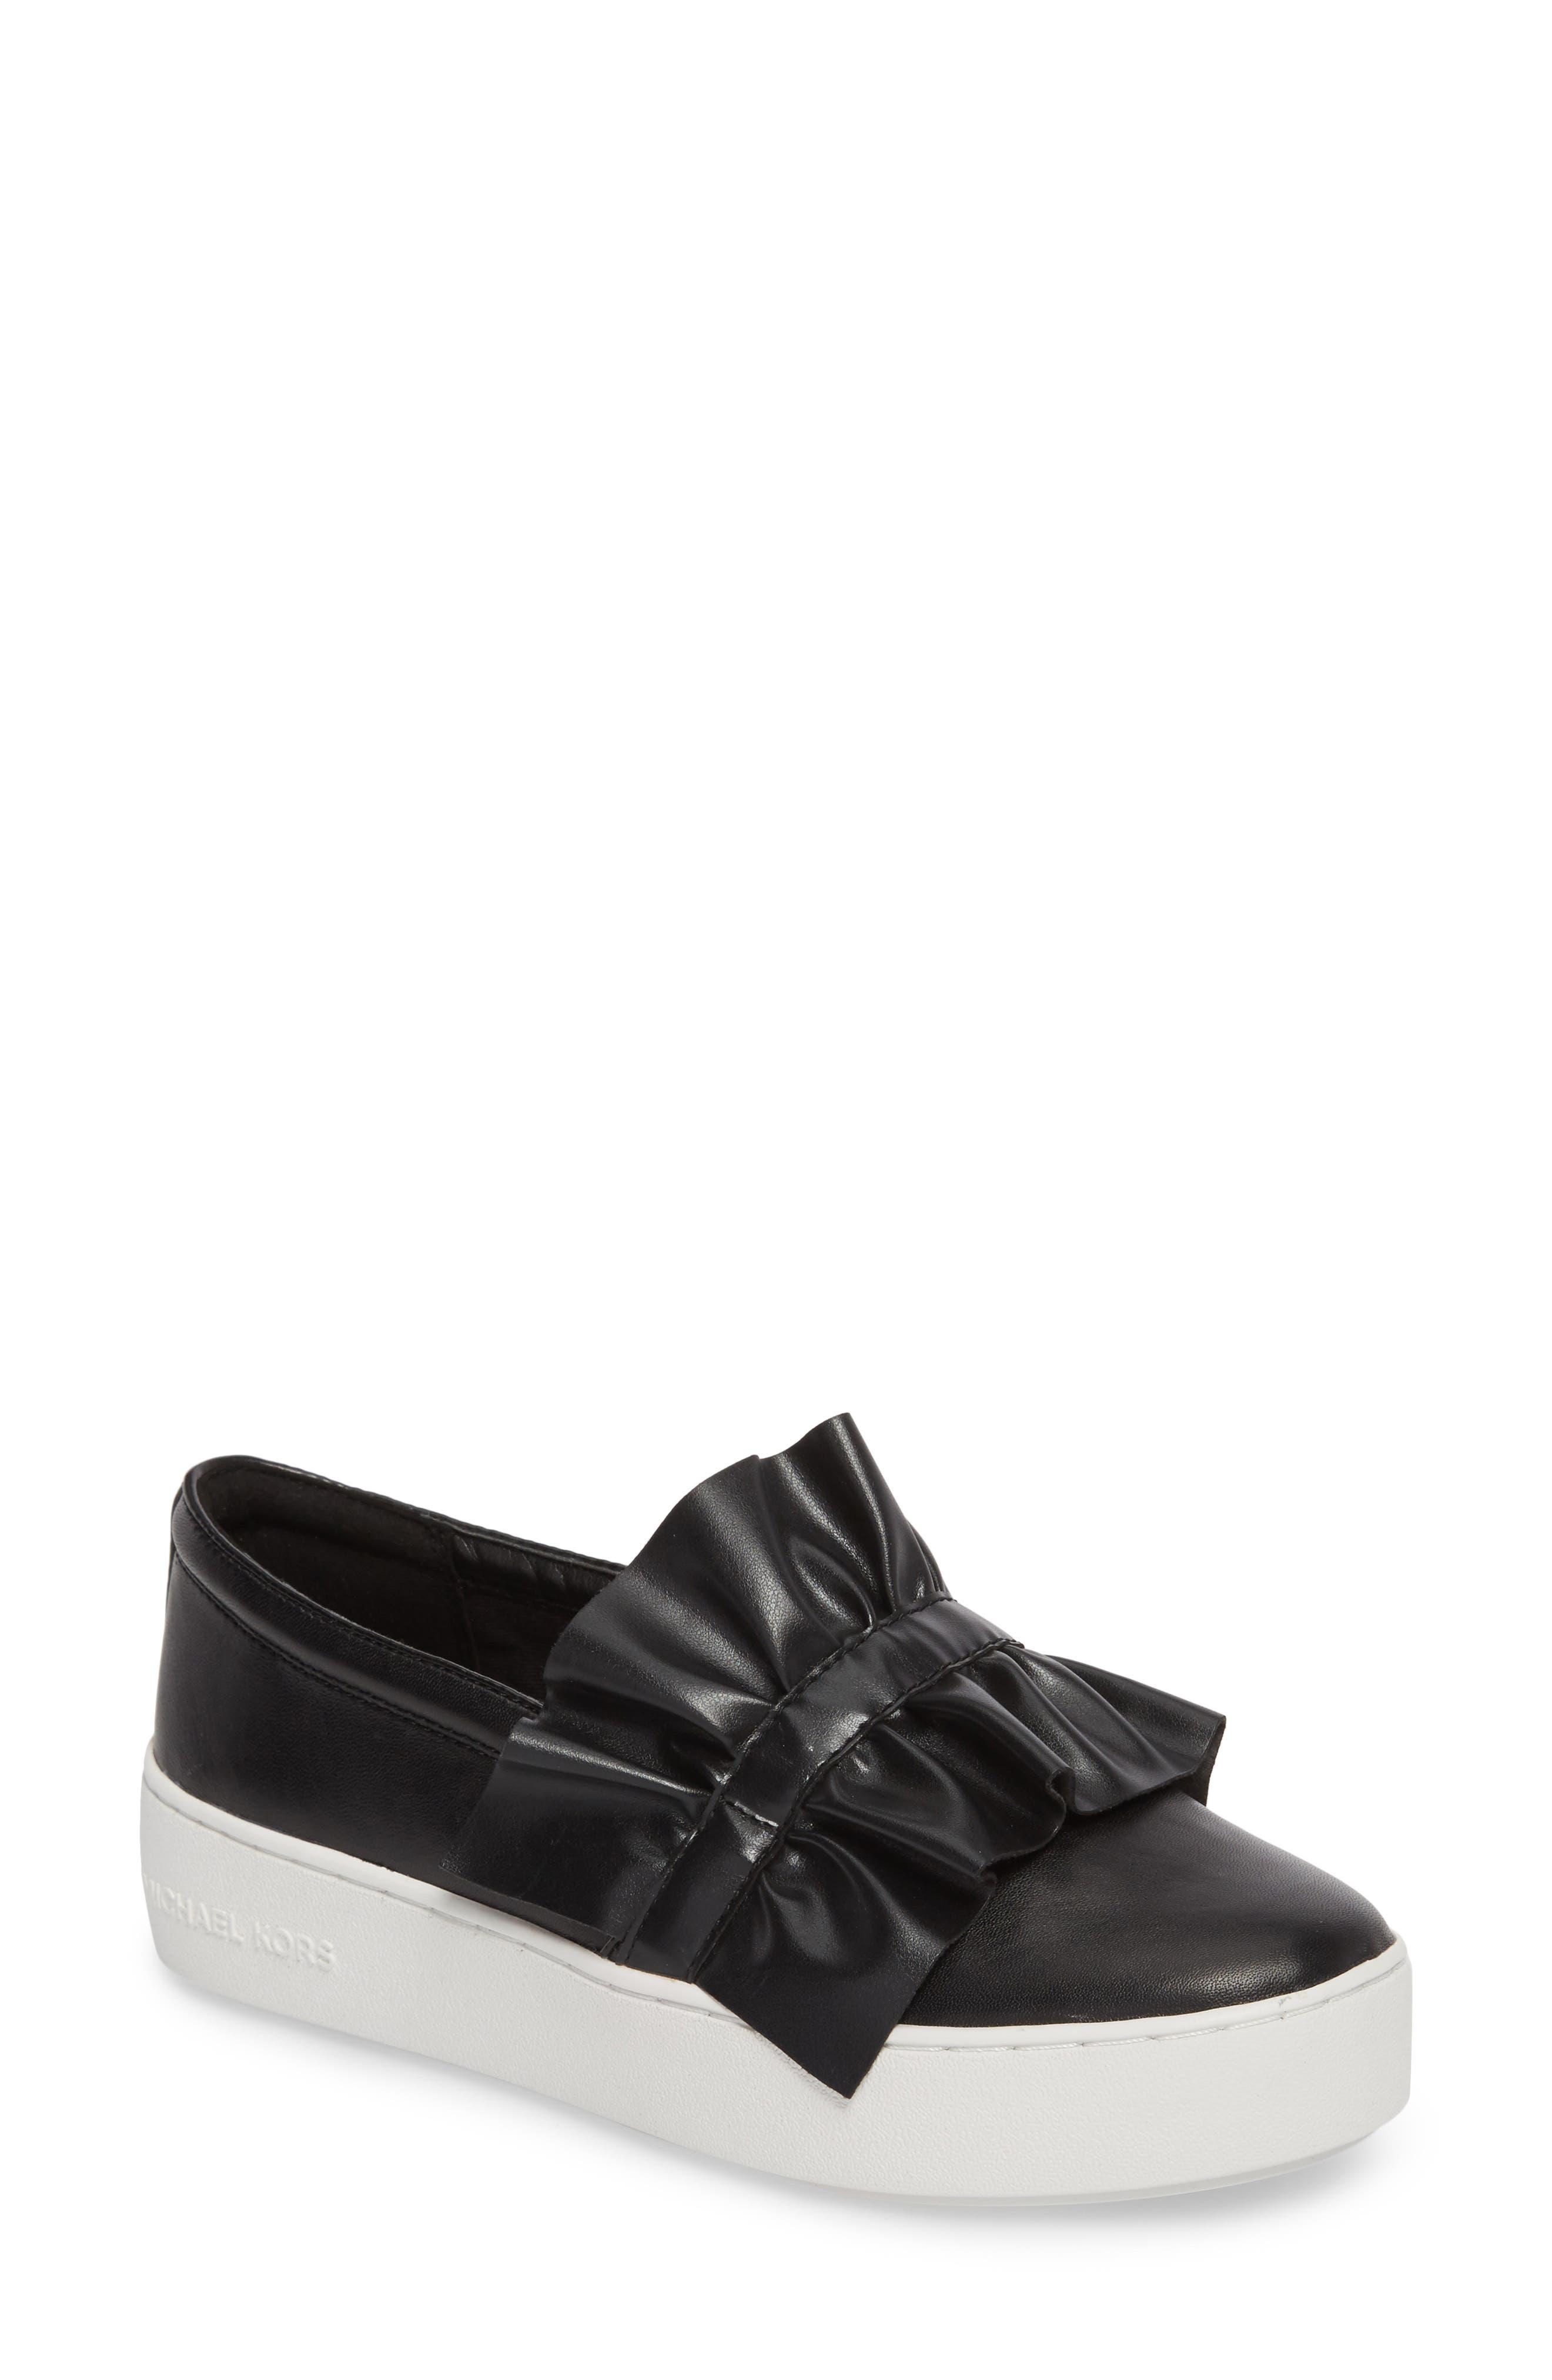 Bella Slip-On Sneaker,                         Main,                         color, 001